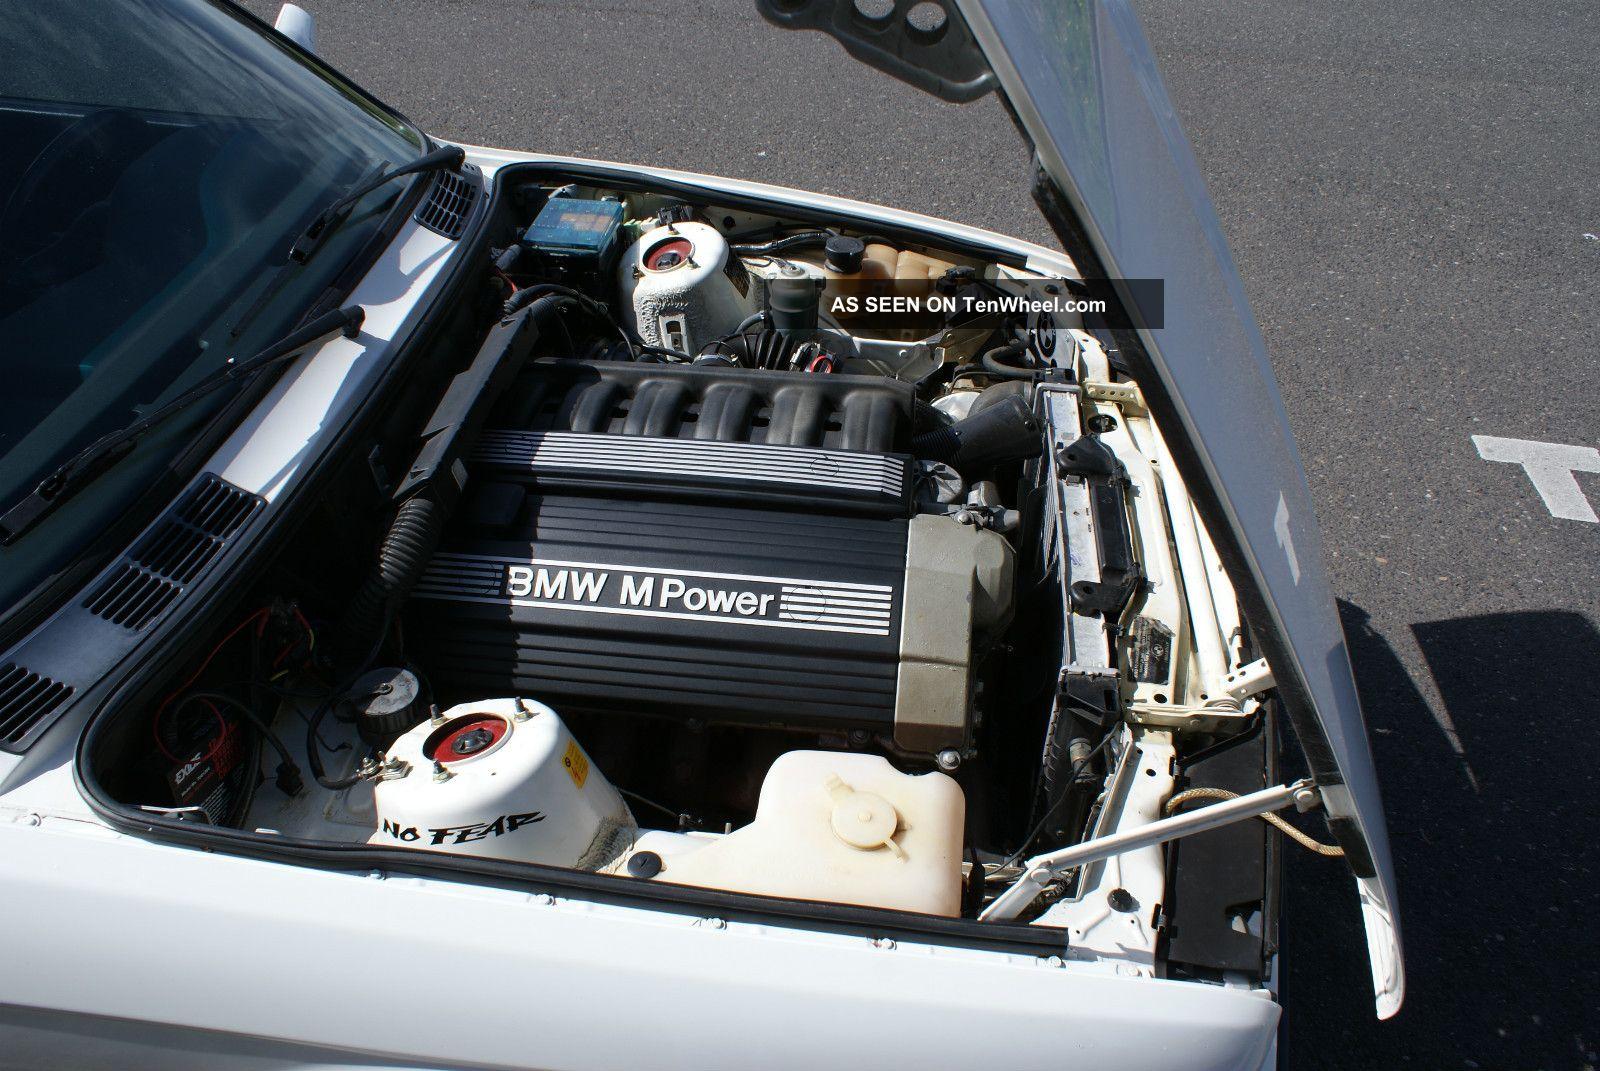 1989 bmw 325is with e36 m3 engine 5 lug e30 m3 interior. Black Bedroom Furniture Sets. Home Design Ideas